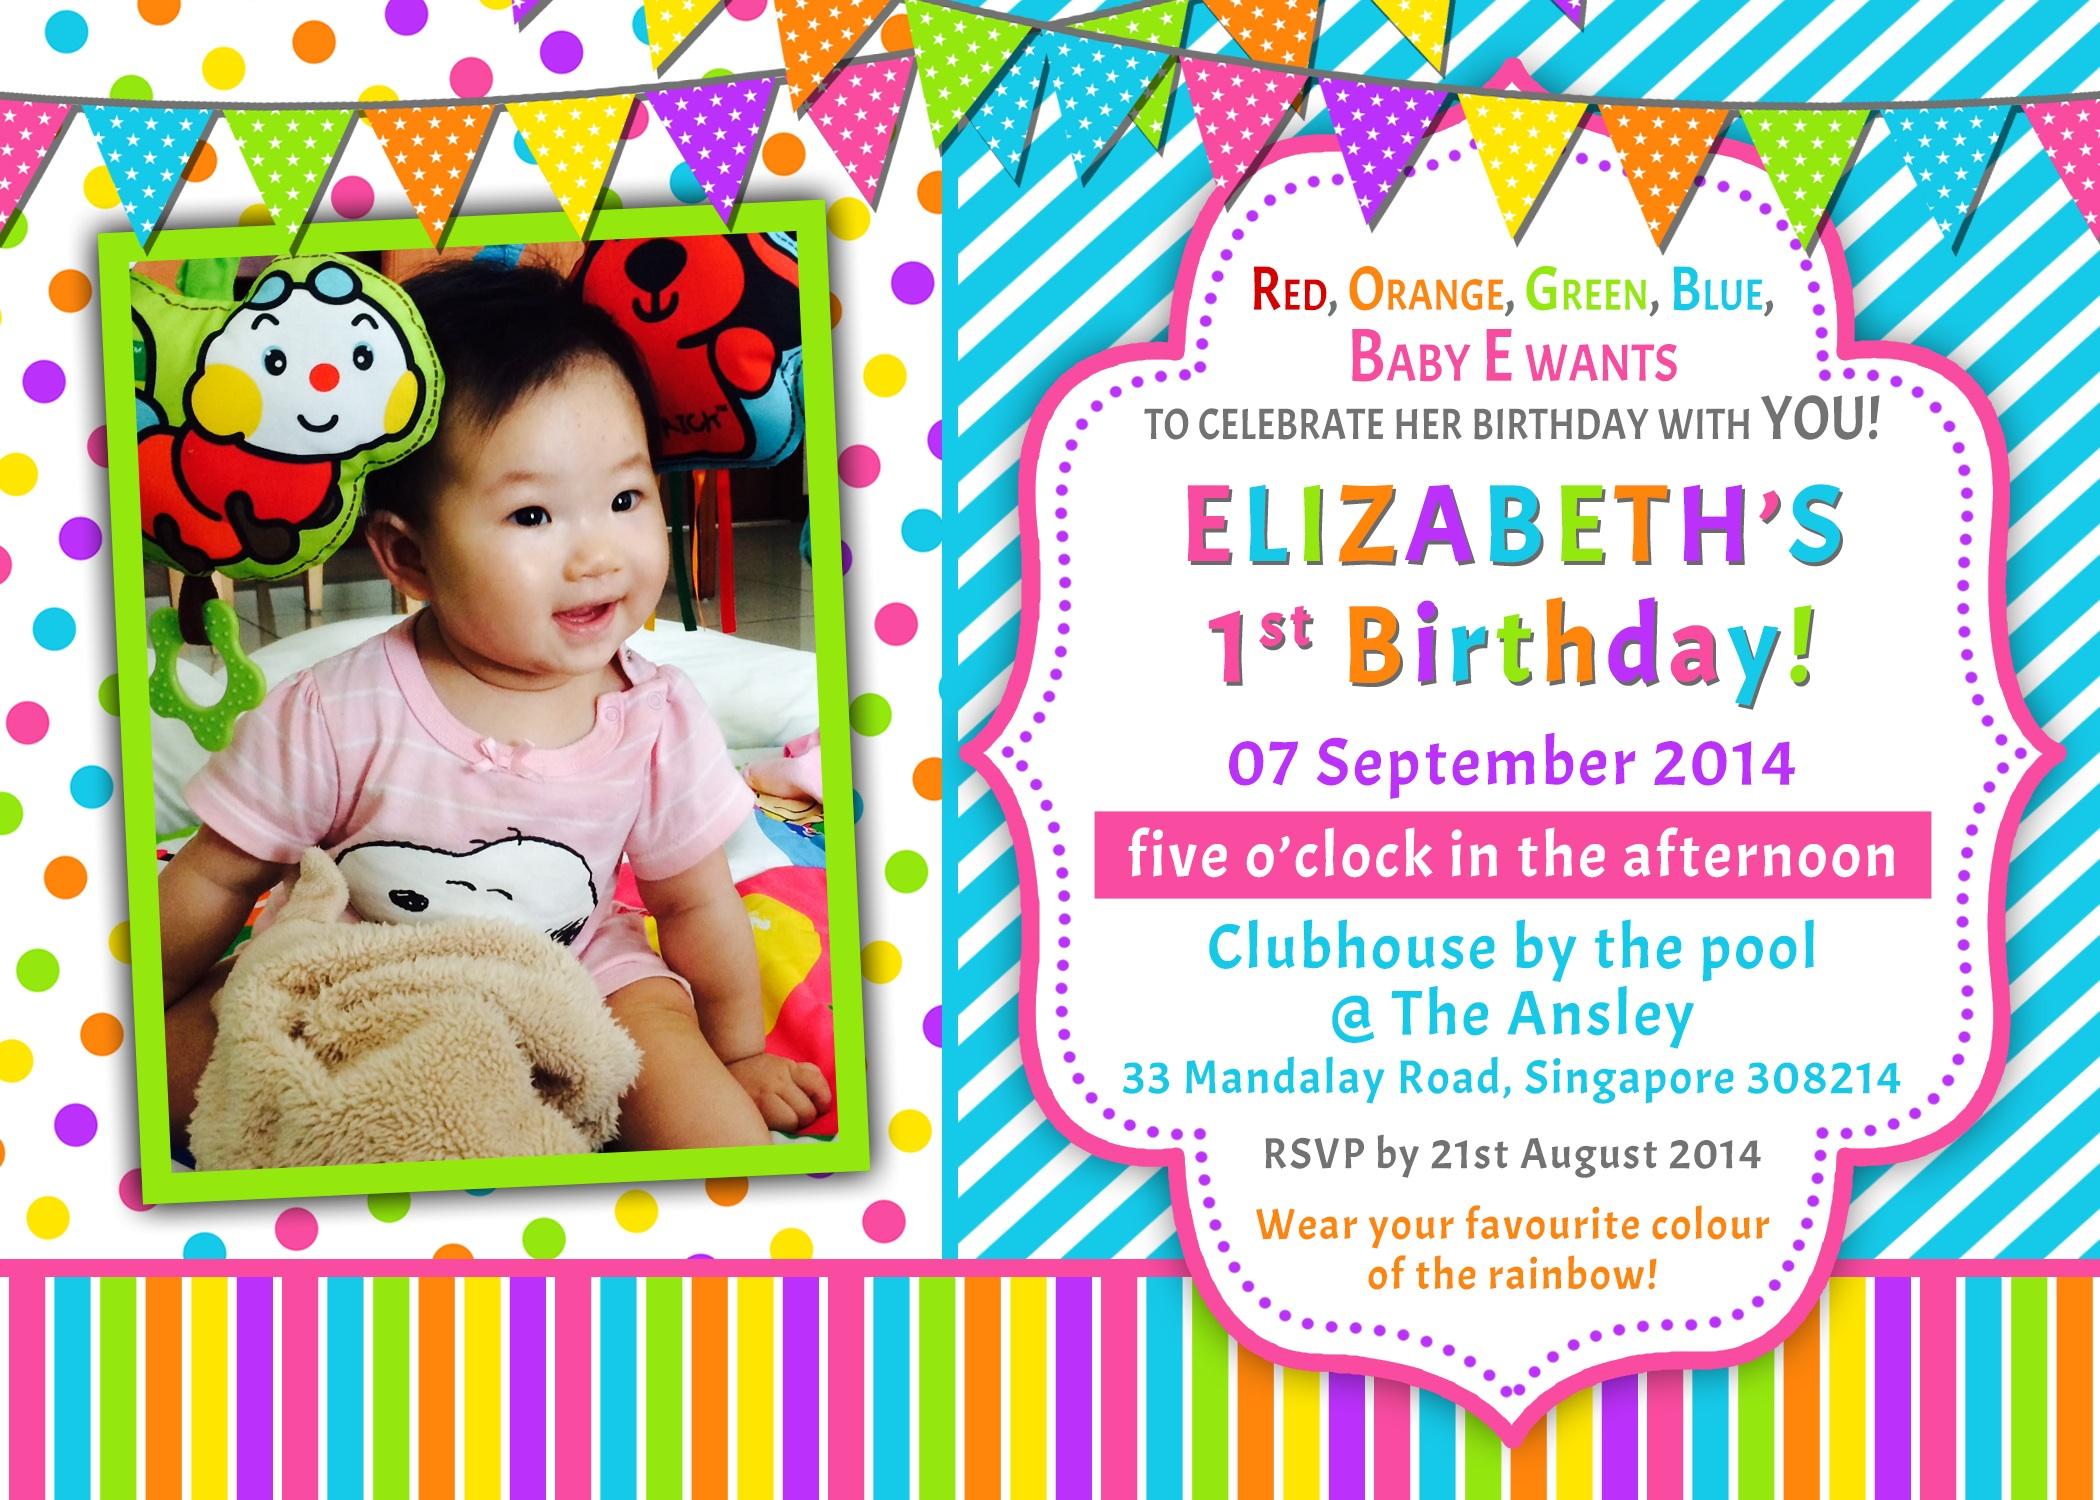 1St Birthday Invitations Templates for beautiful invitation ideas